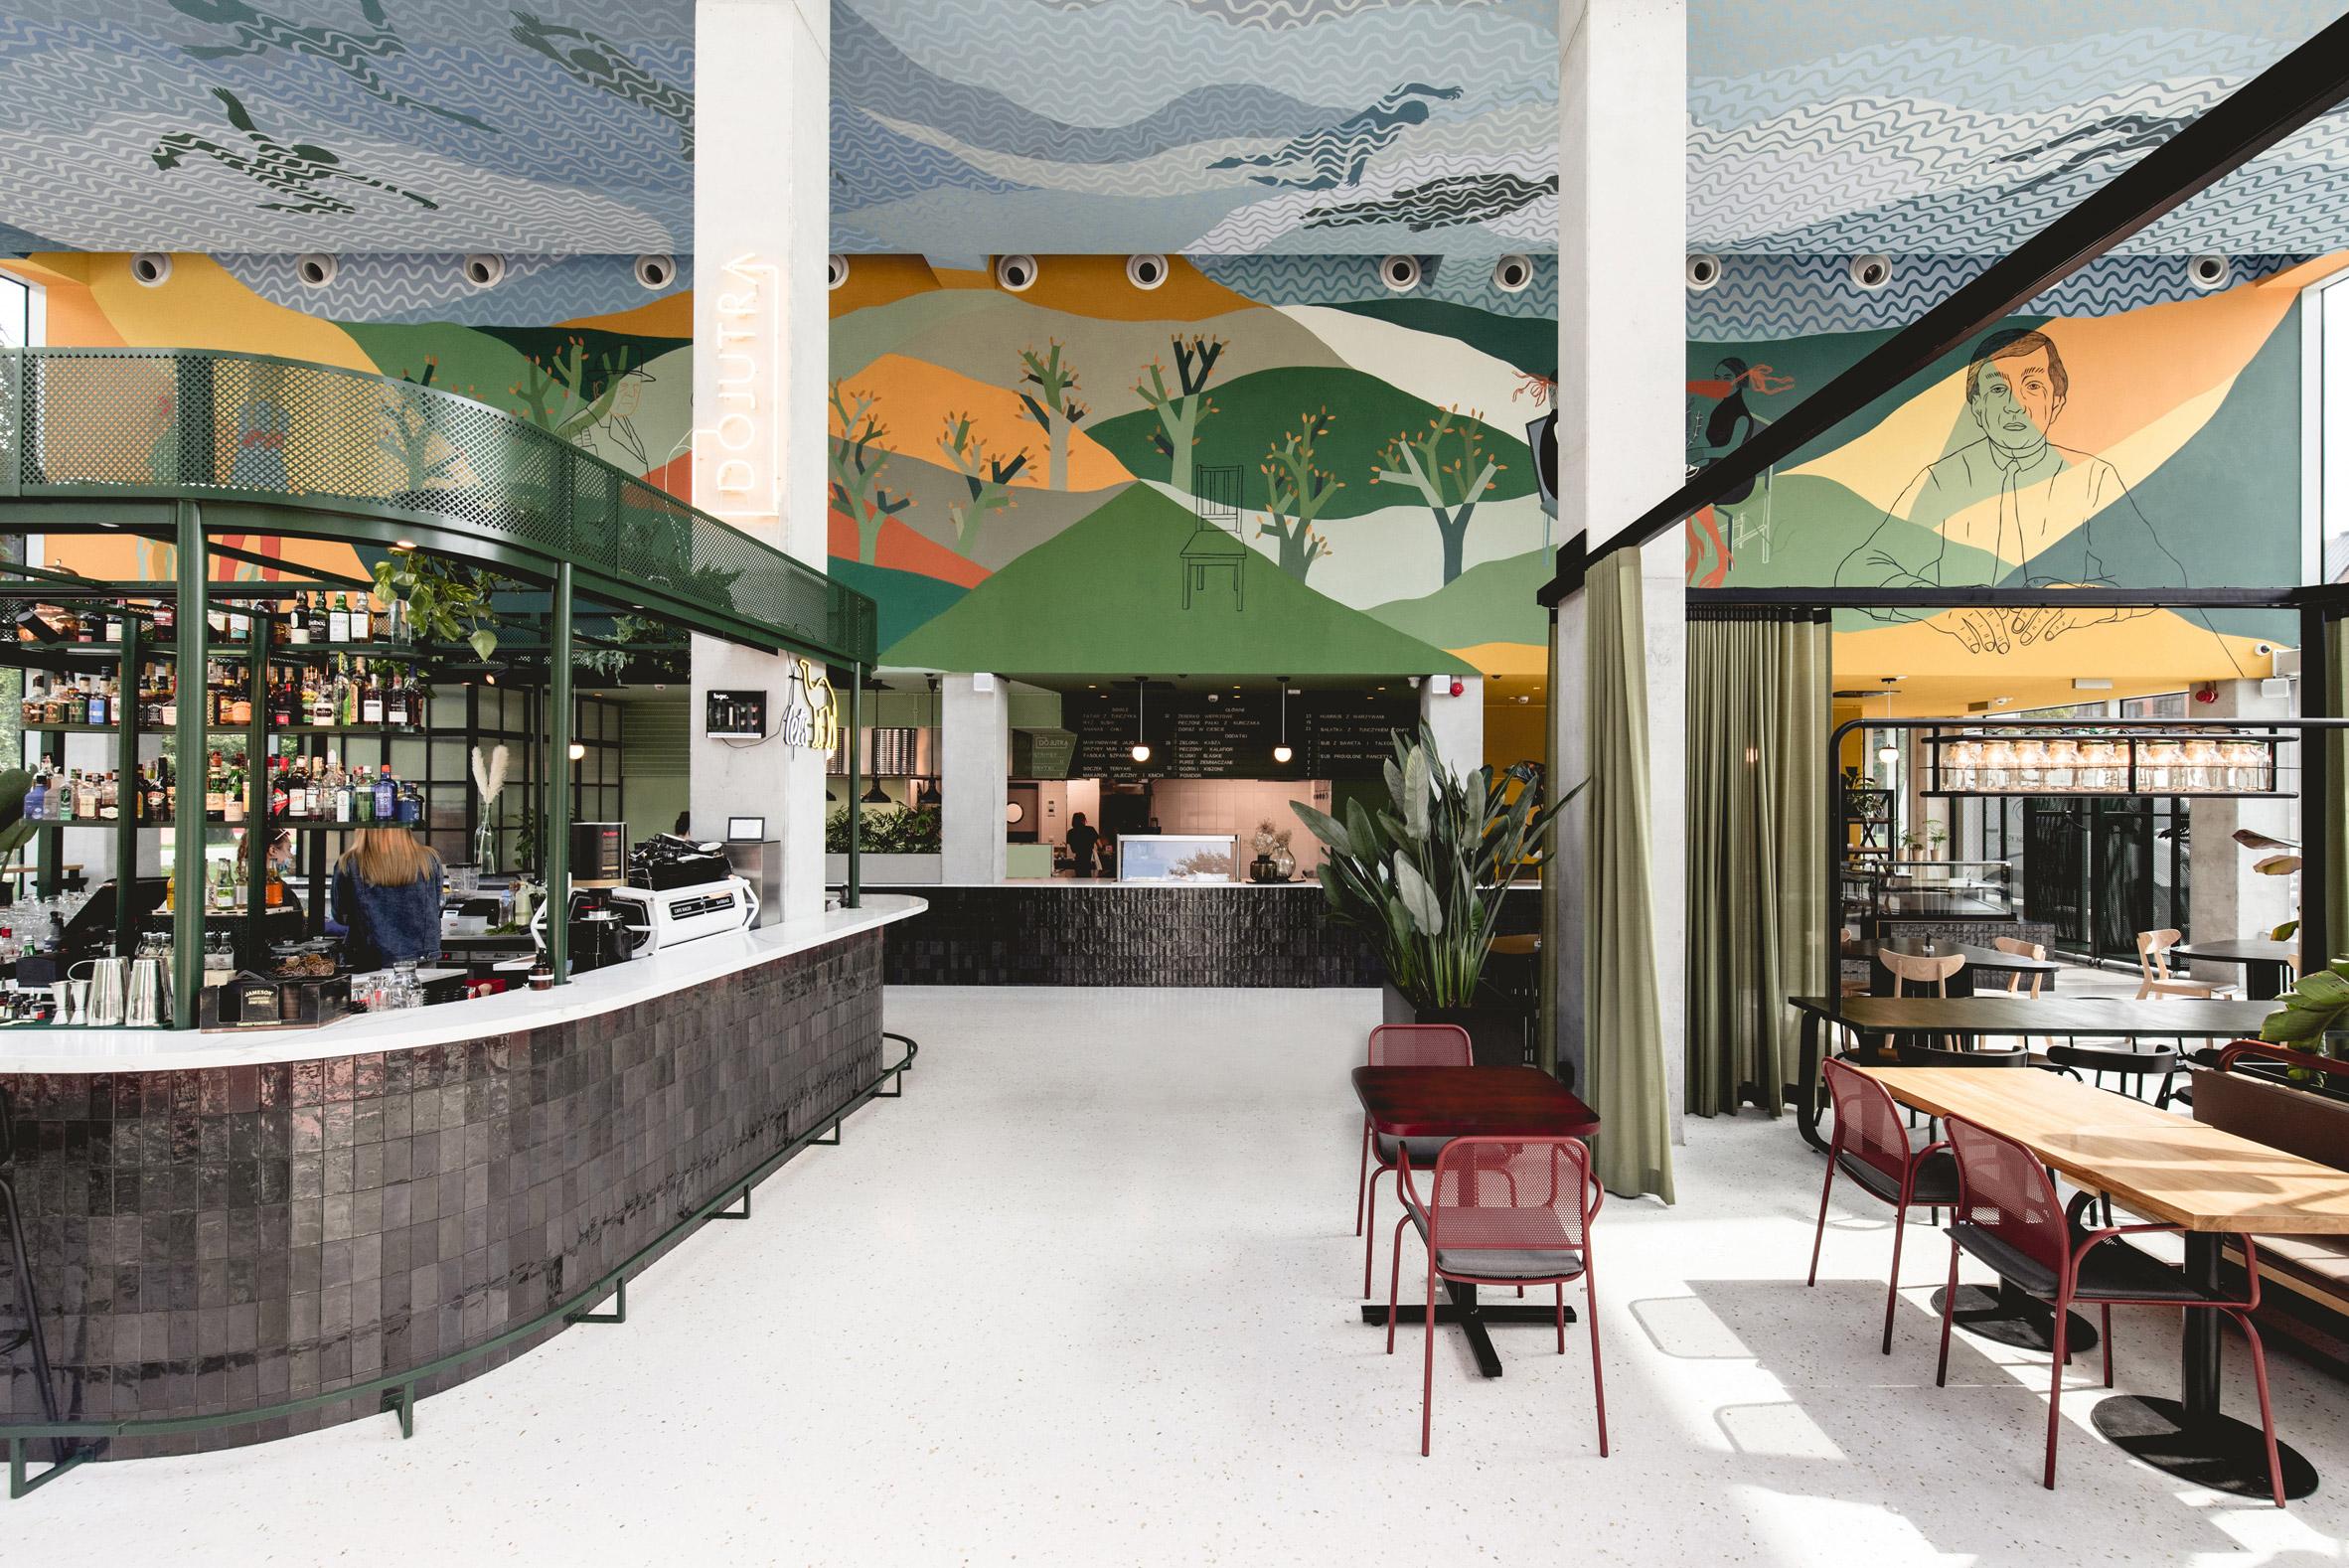 Restaurant at Concordia Design by MVRDV and Alicja Biala